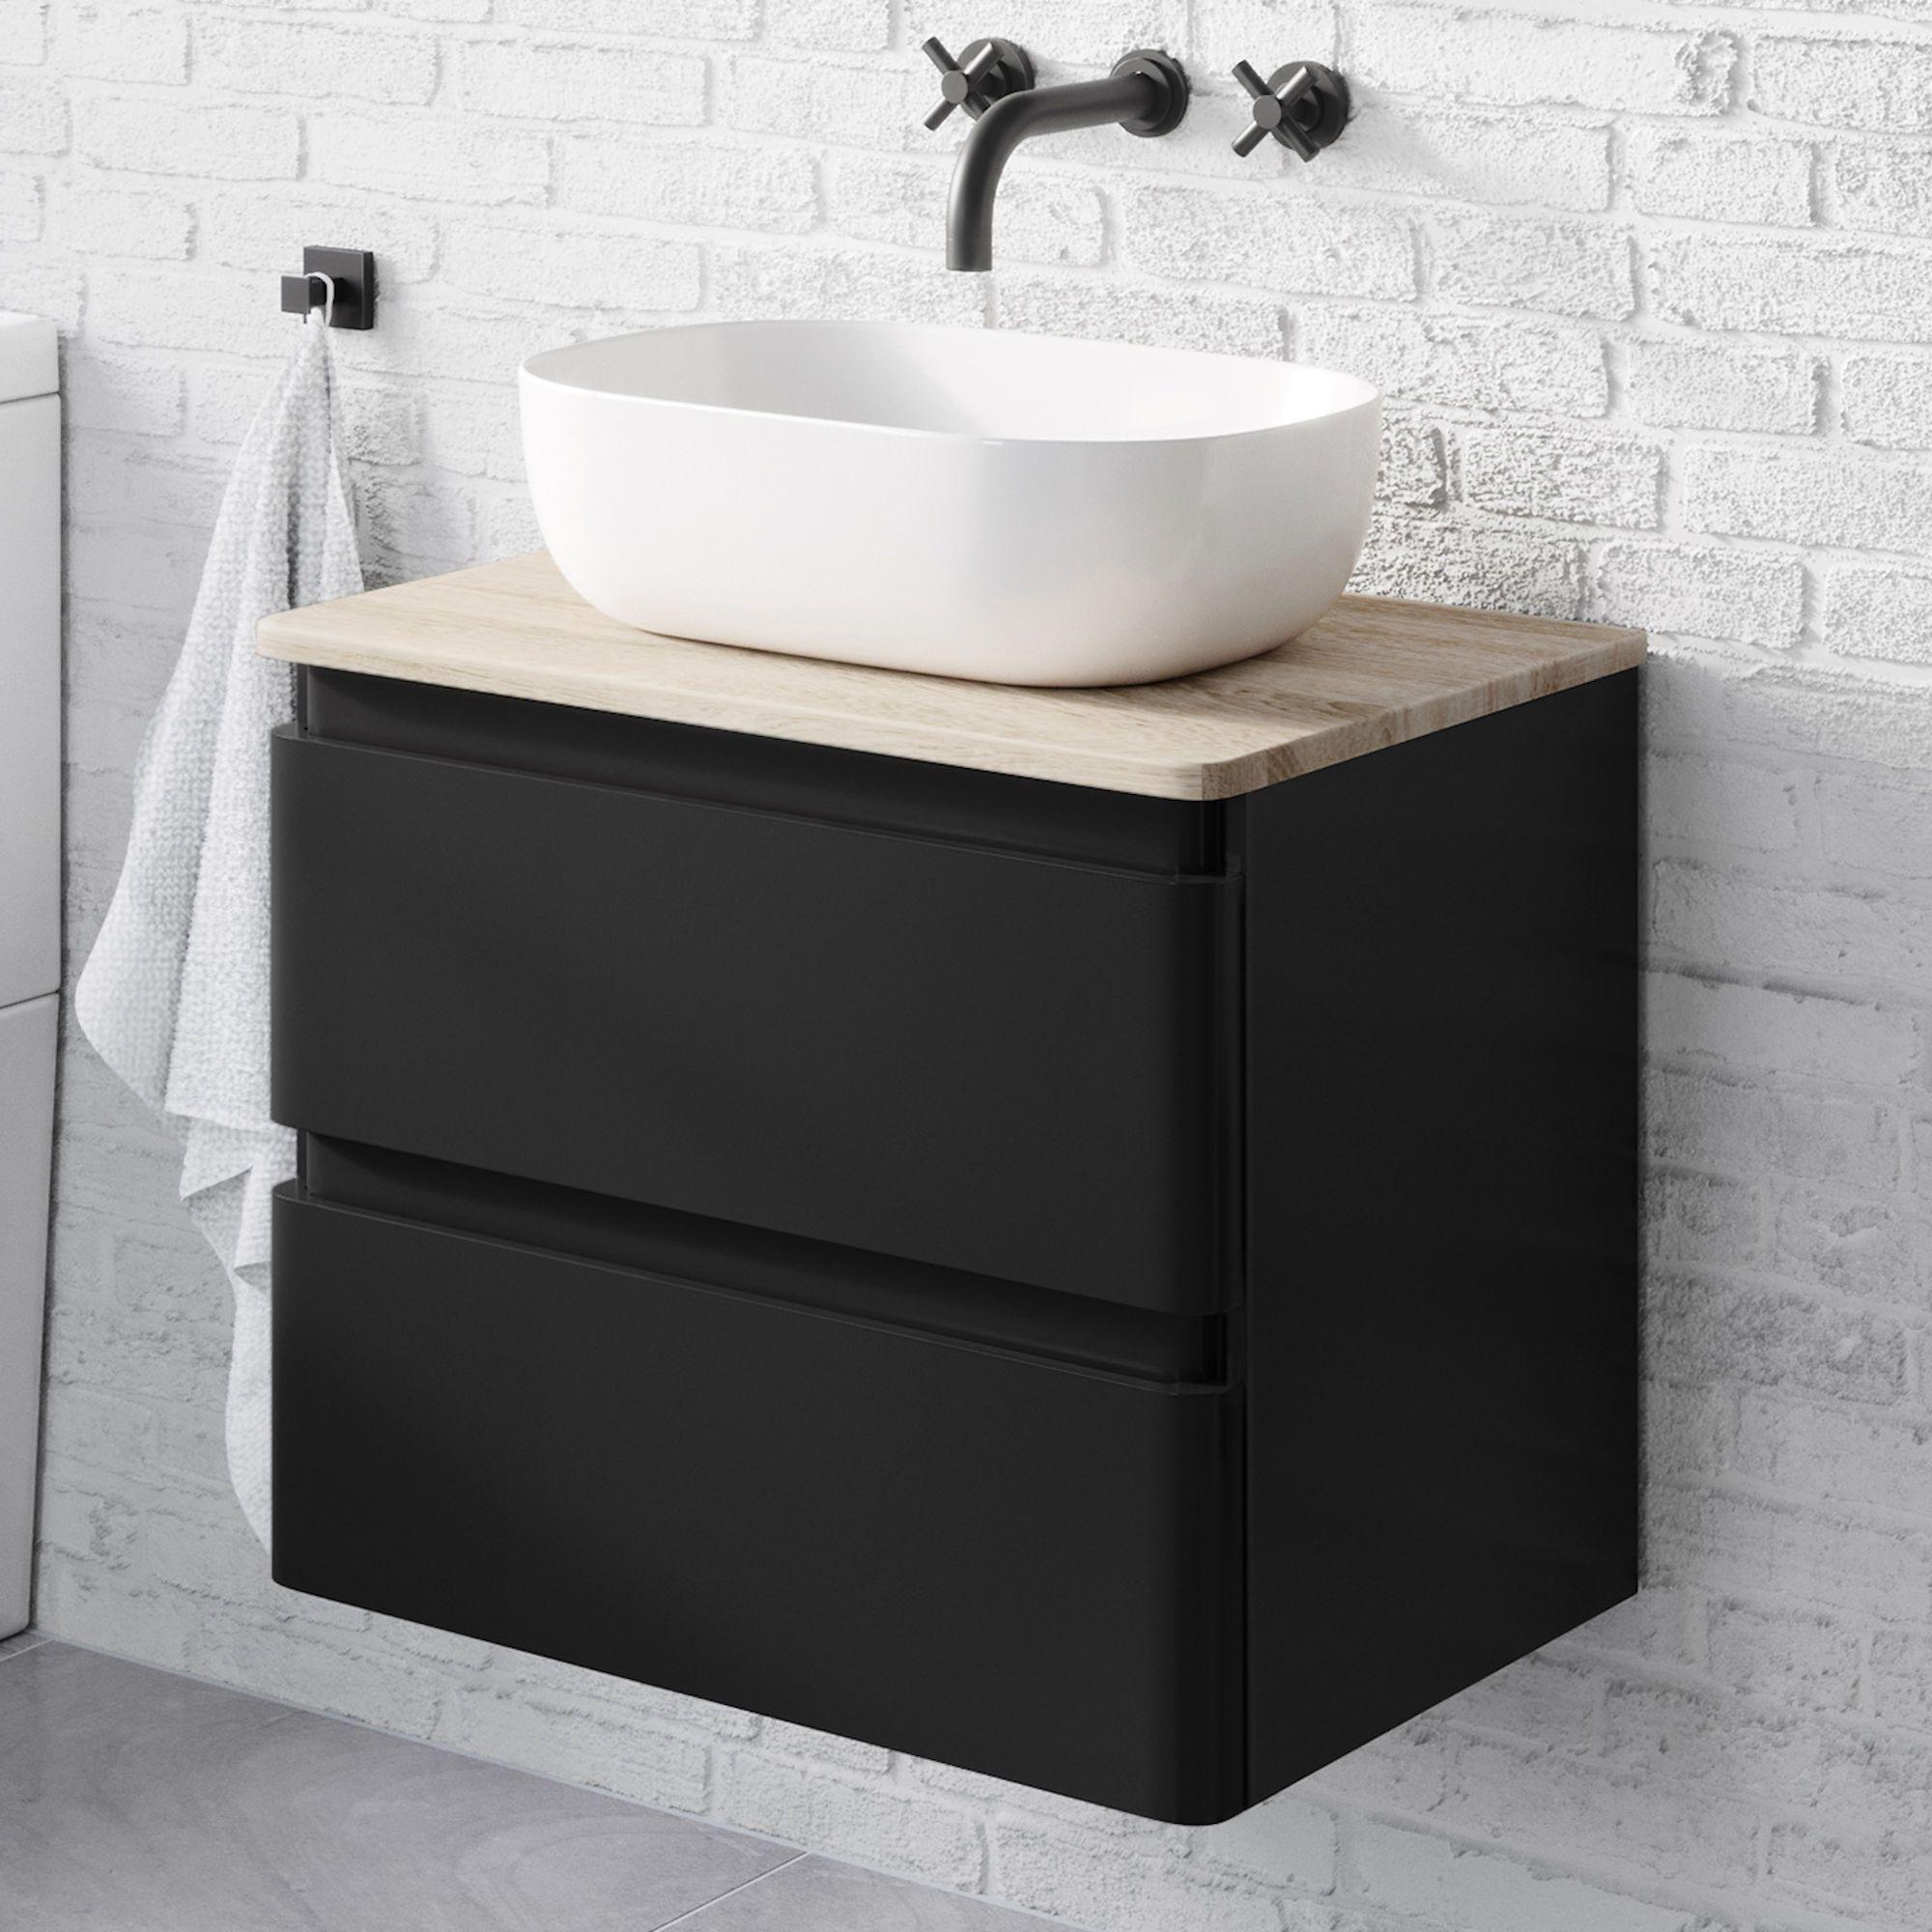 Black Bathroom Wall Cabinet With Sink Black Vanity Unit Soak